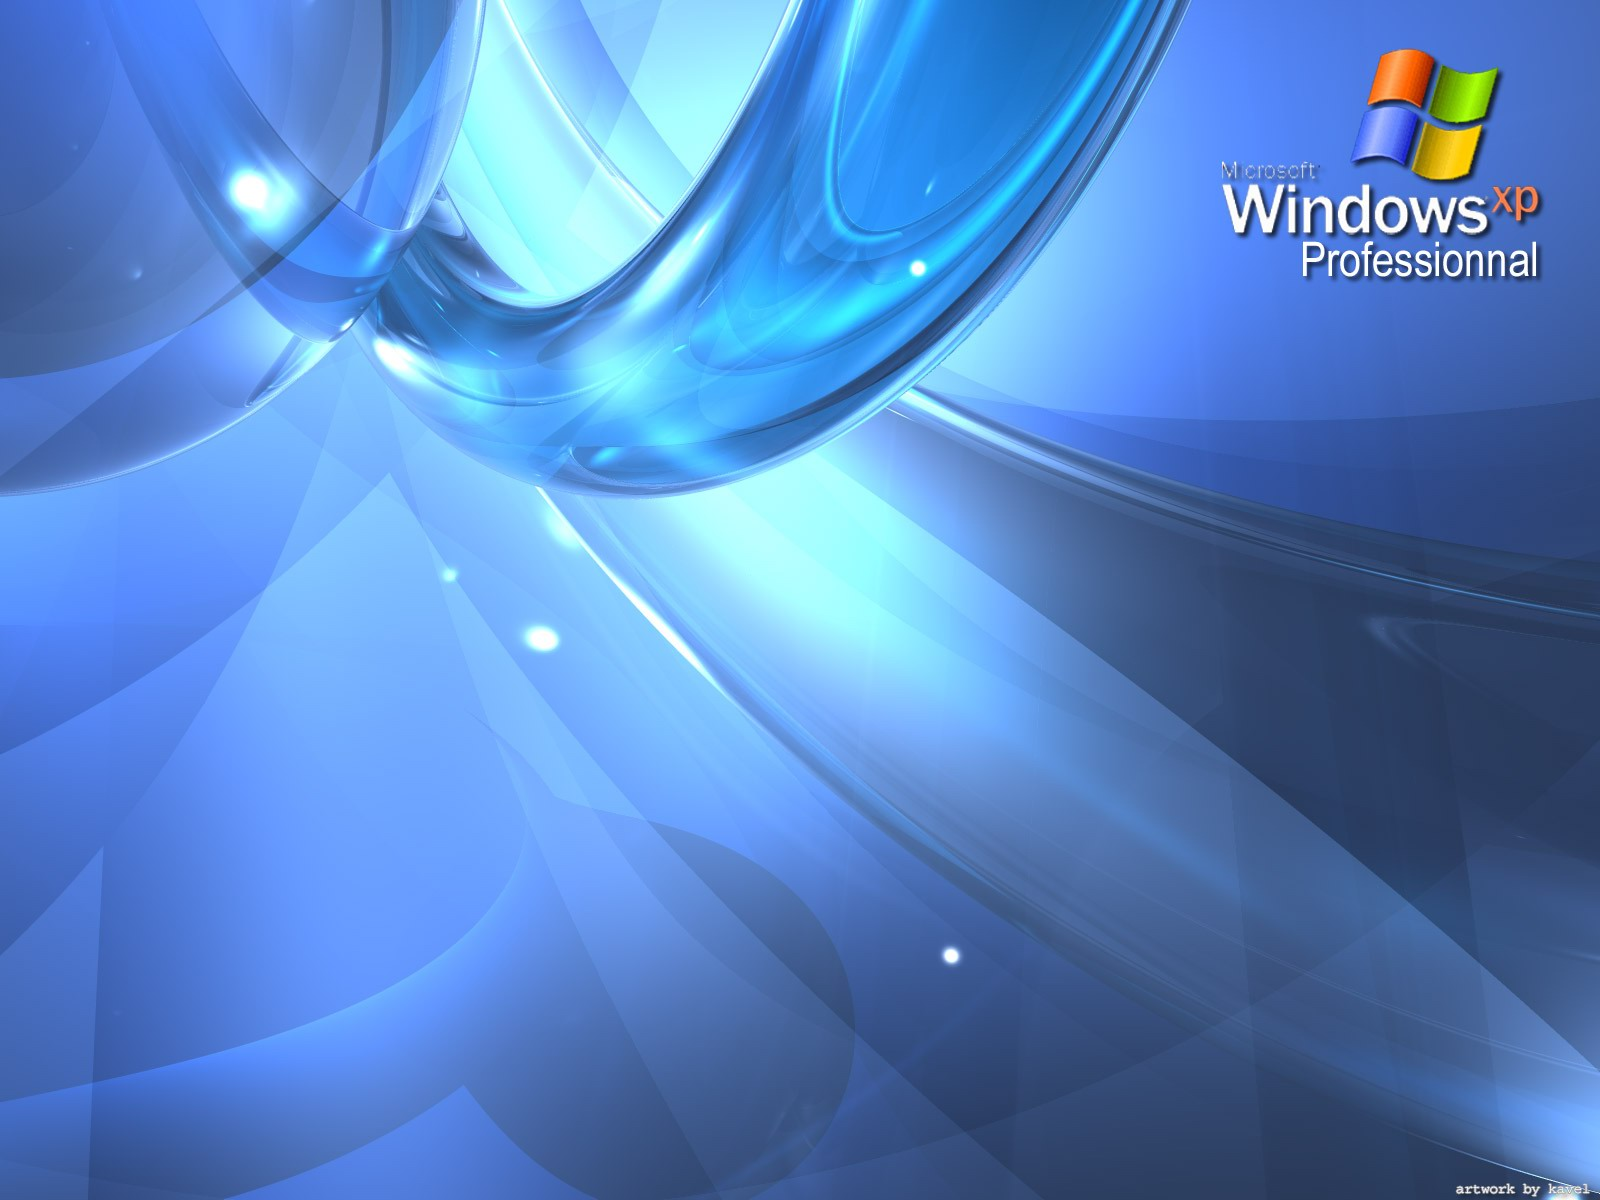 pdf download free download windows xp